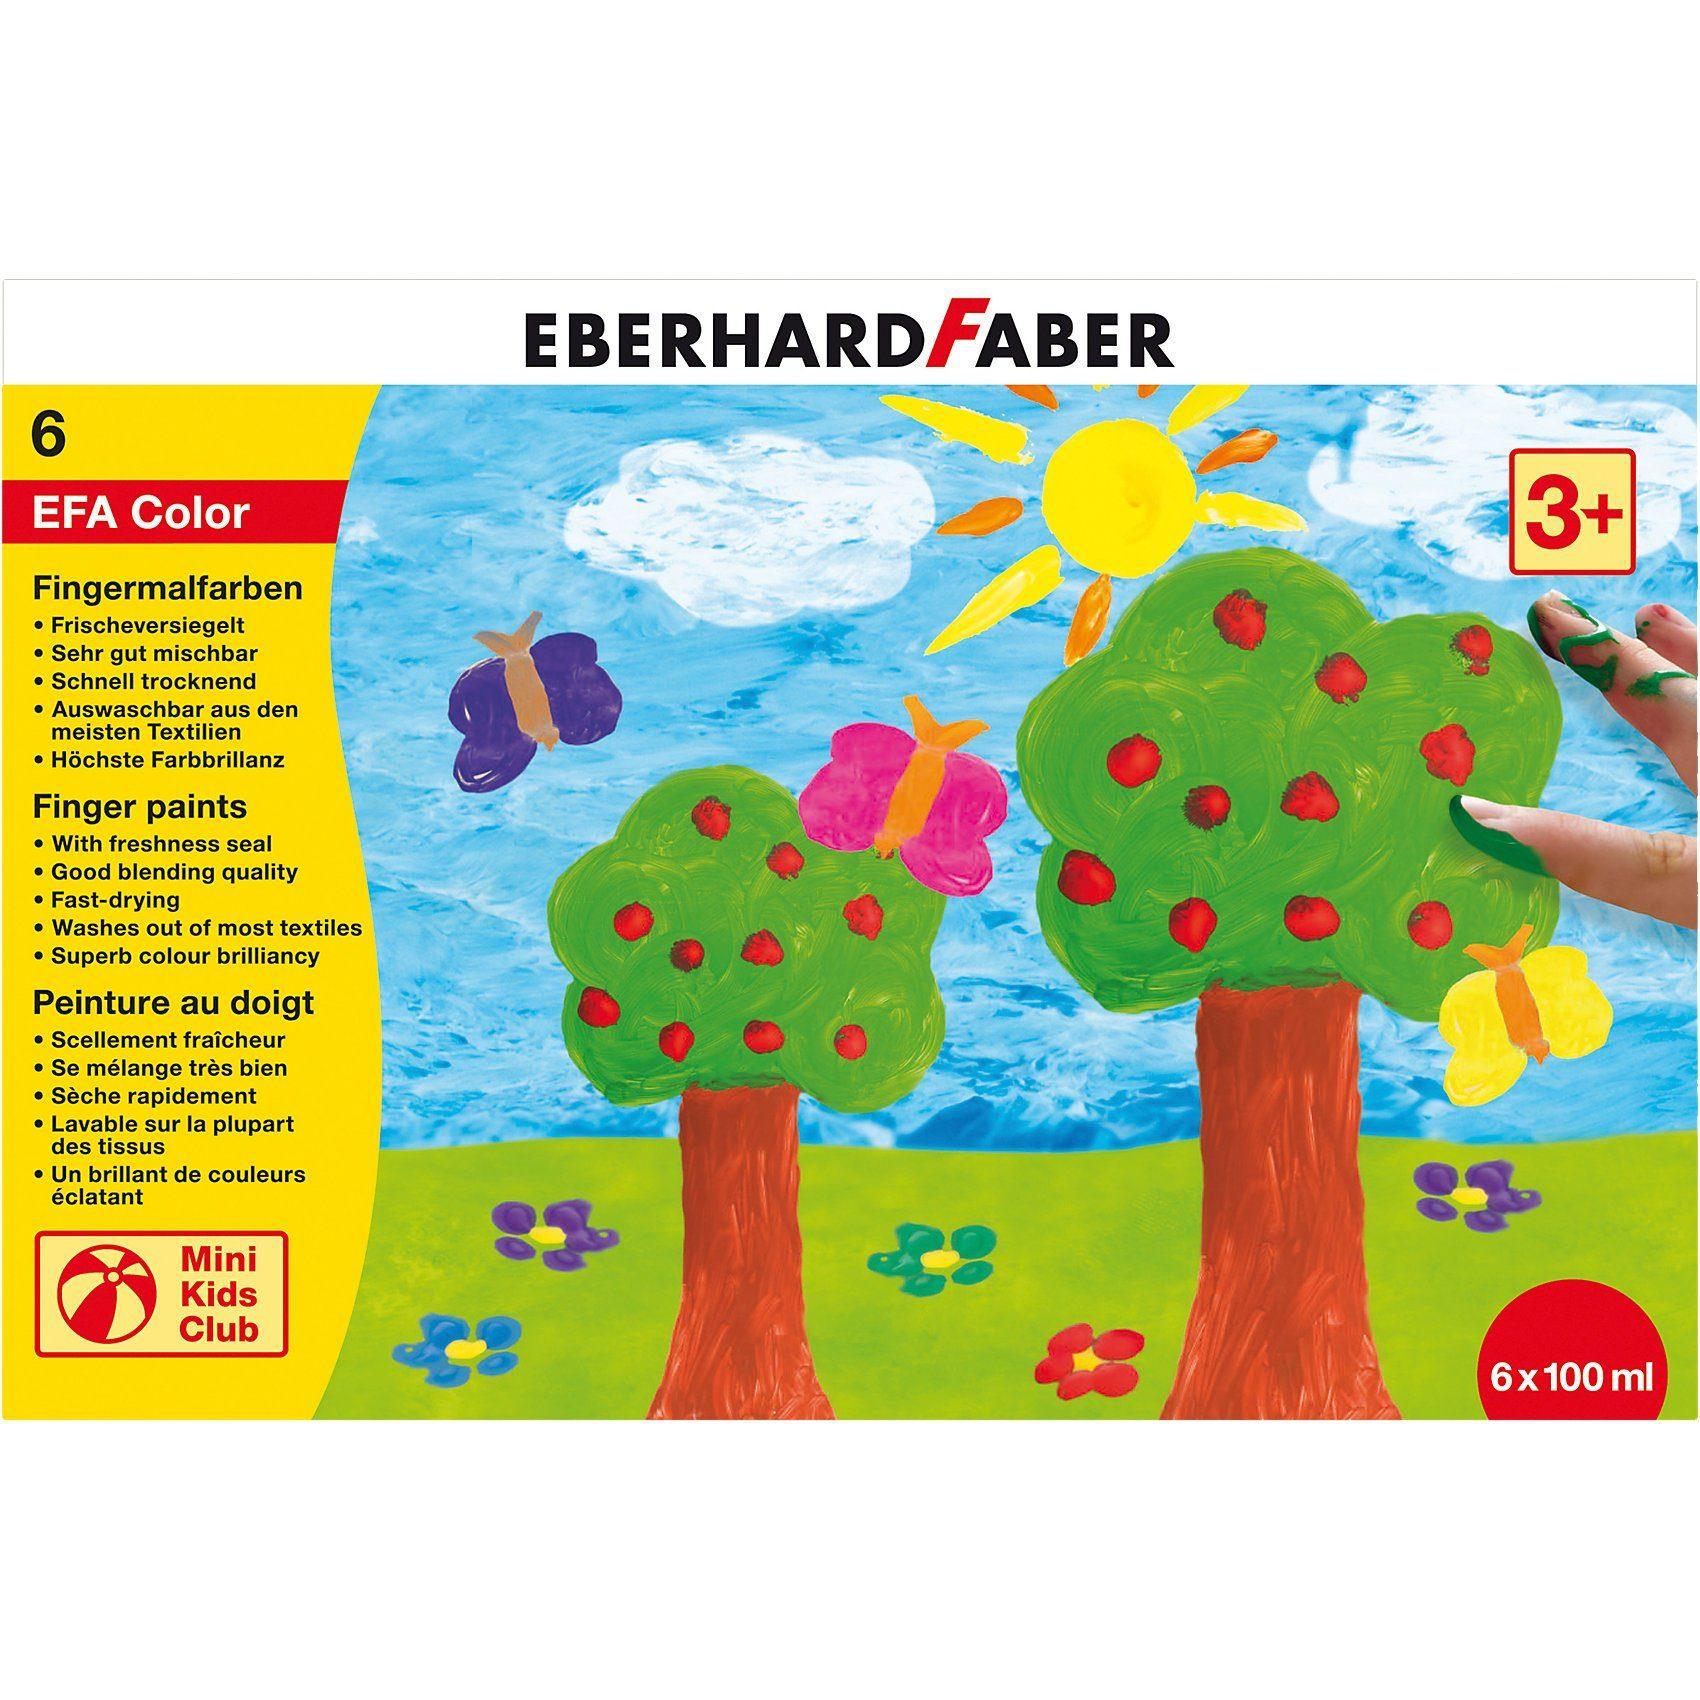 Eberhard Faber Mini Kids Fingermalfarbe, 6 x 100 ml